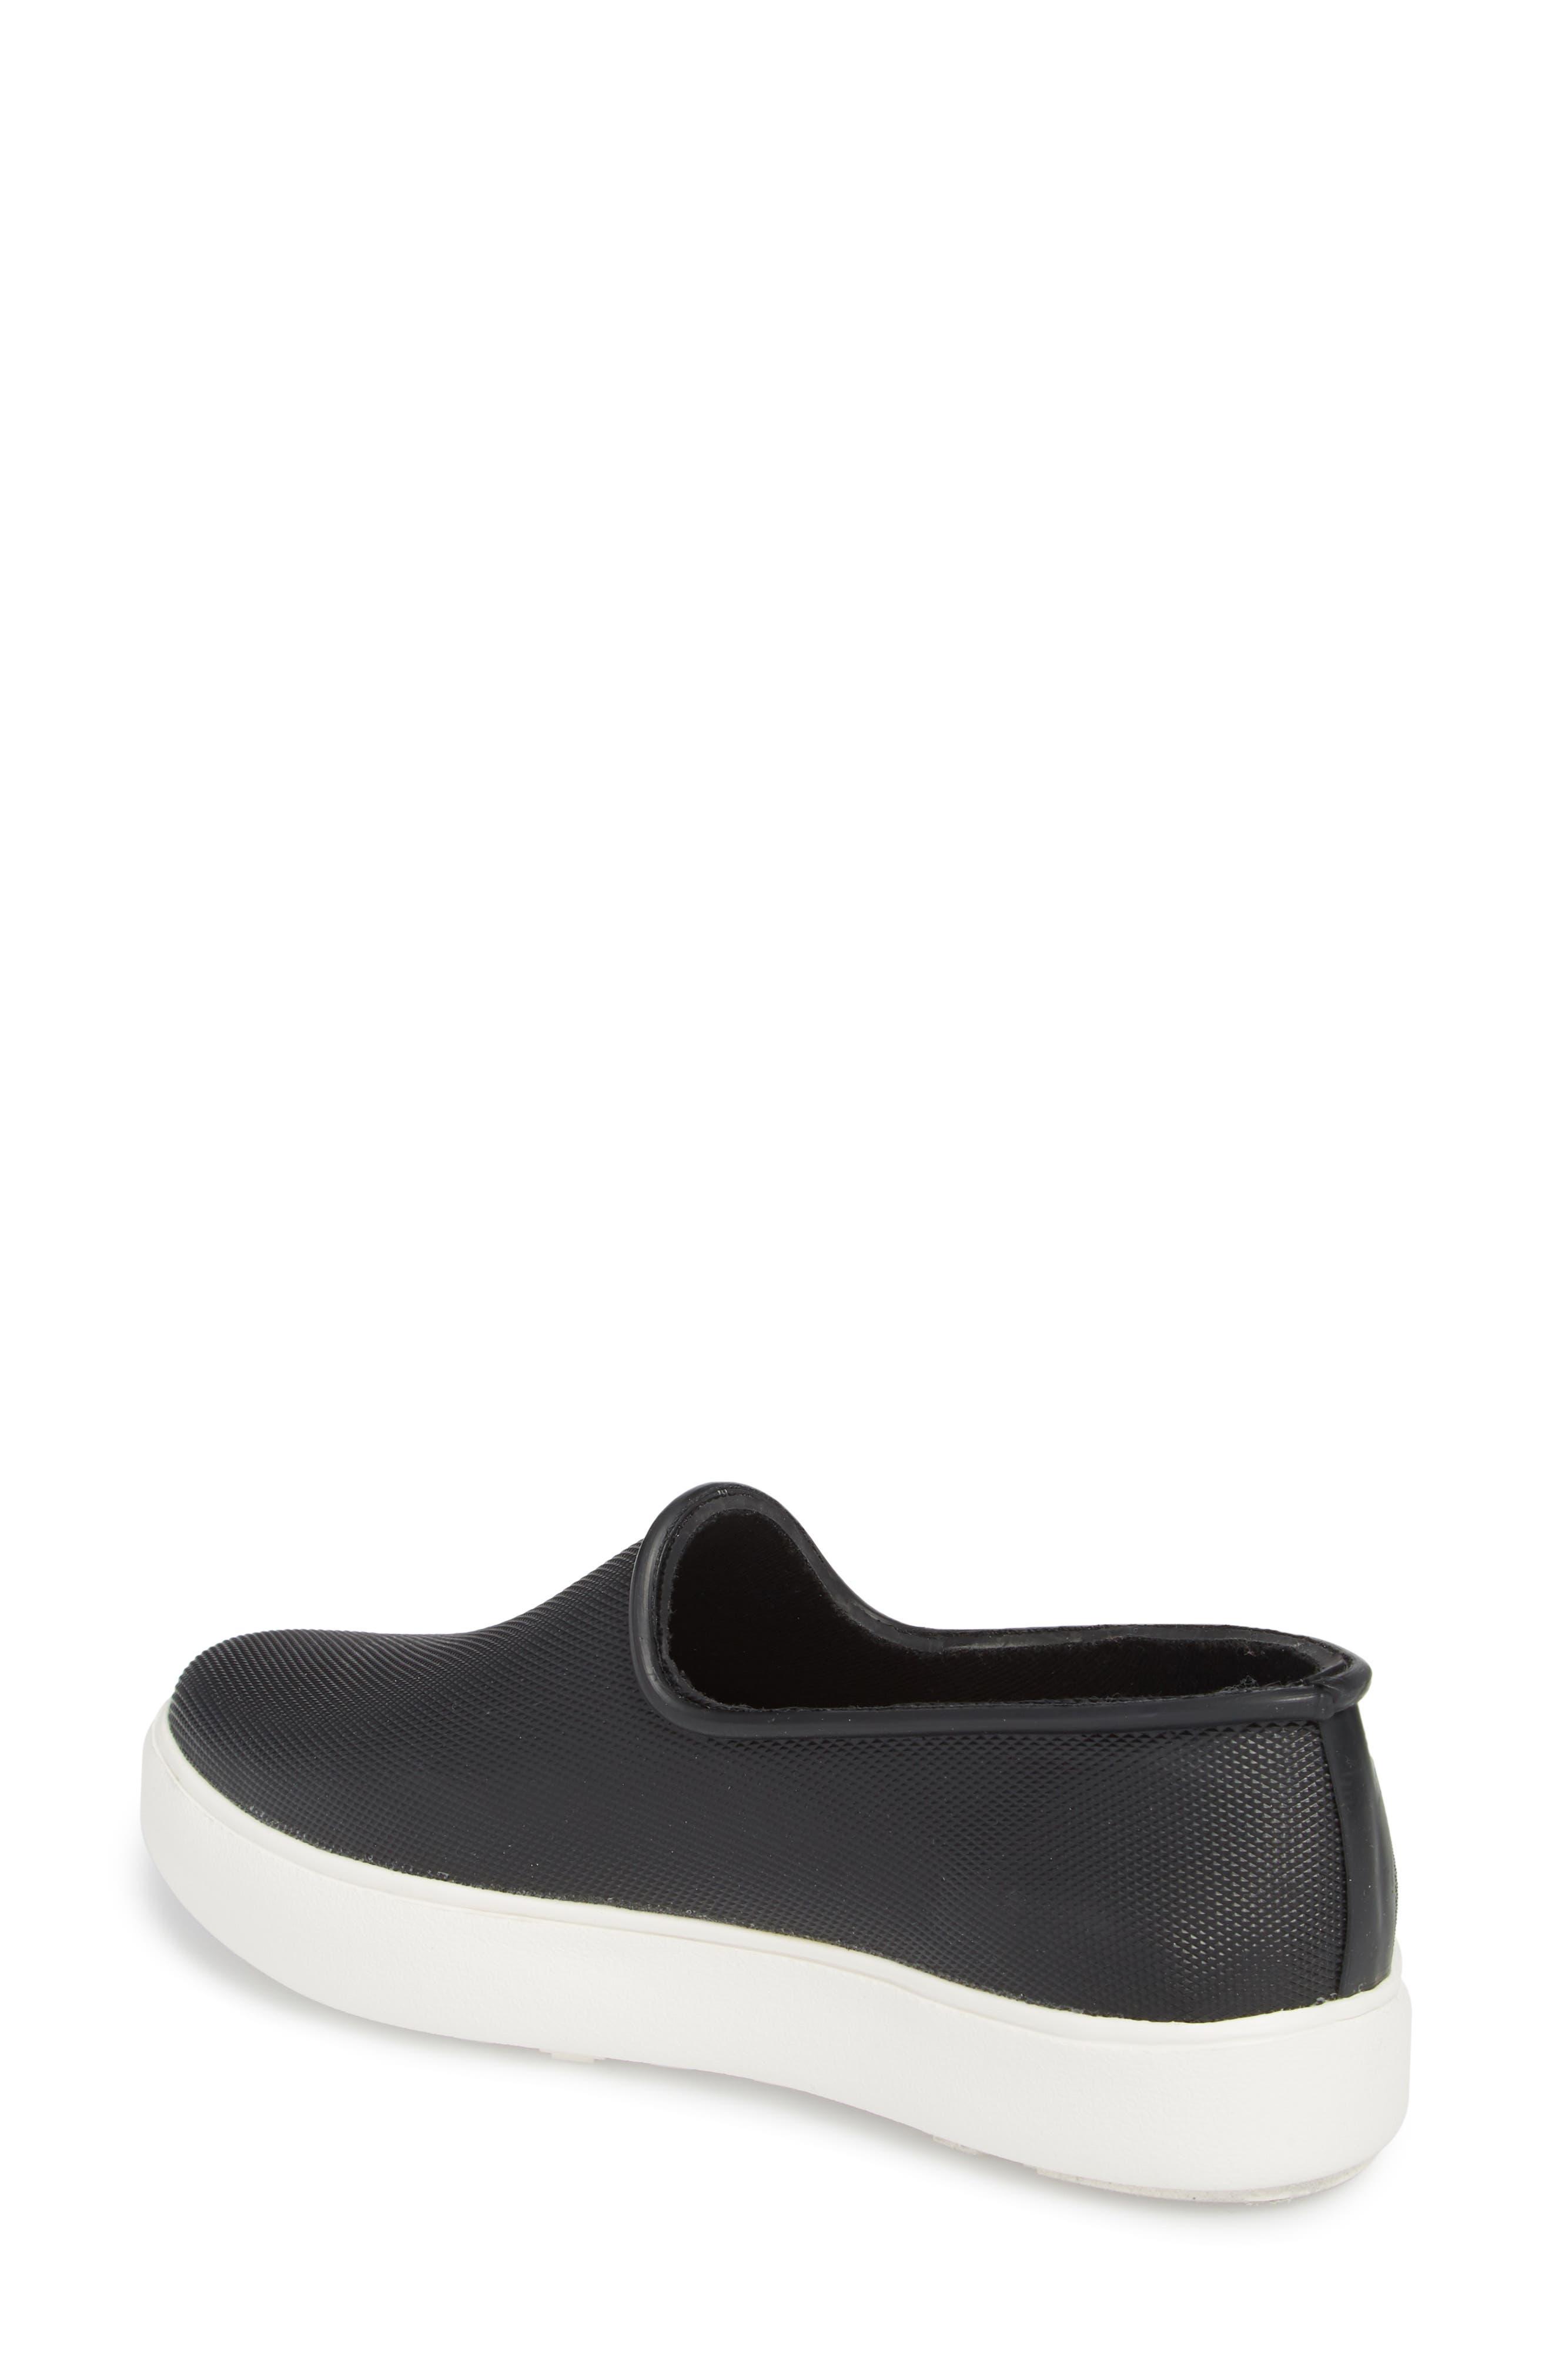 Rainy Day Waterproof Slip-On Sneaker,                             Alternate thumbnail 2, color,                             001